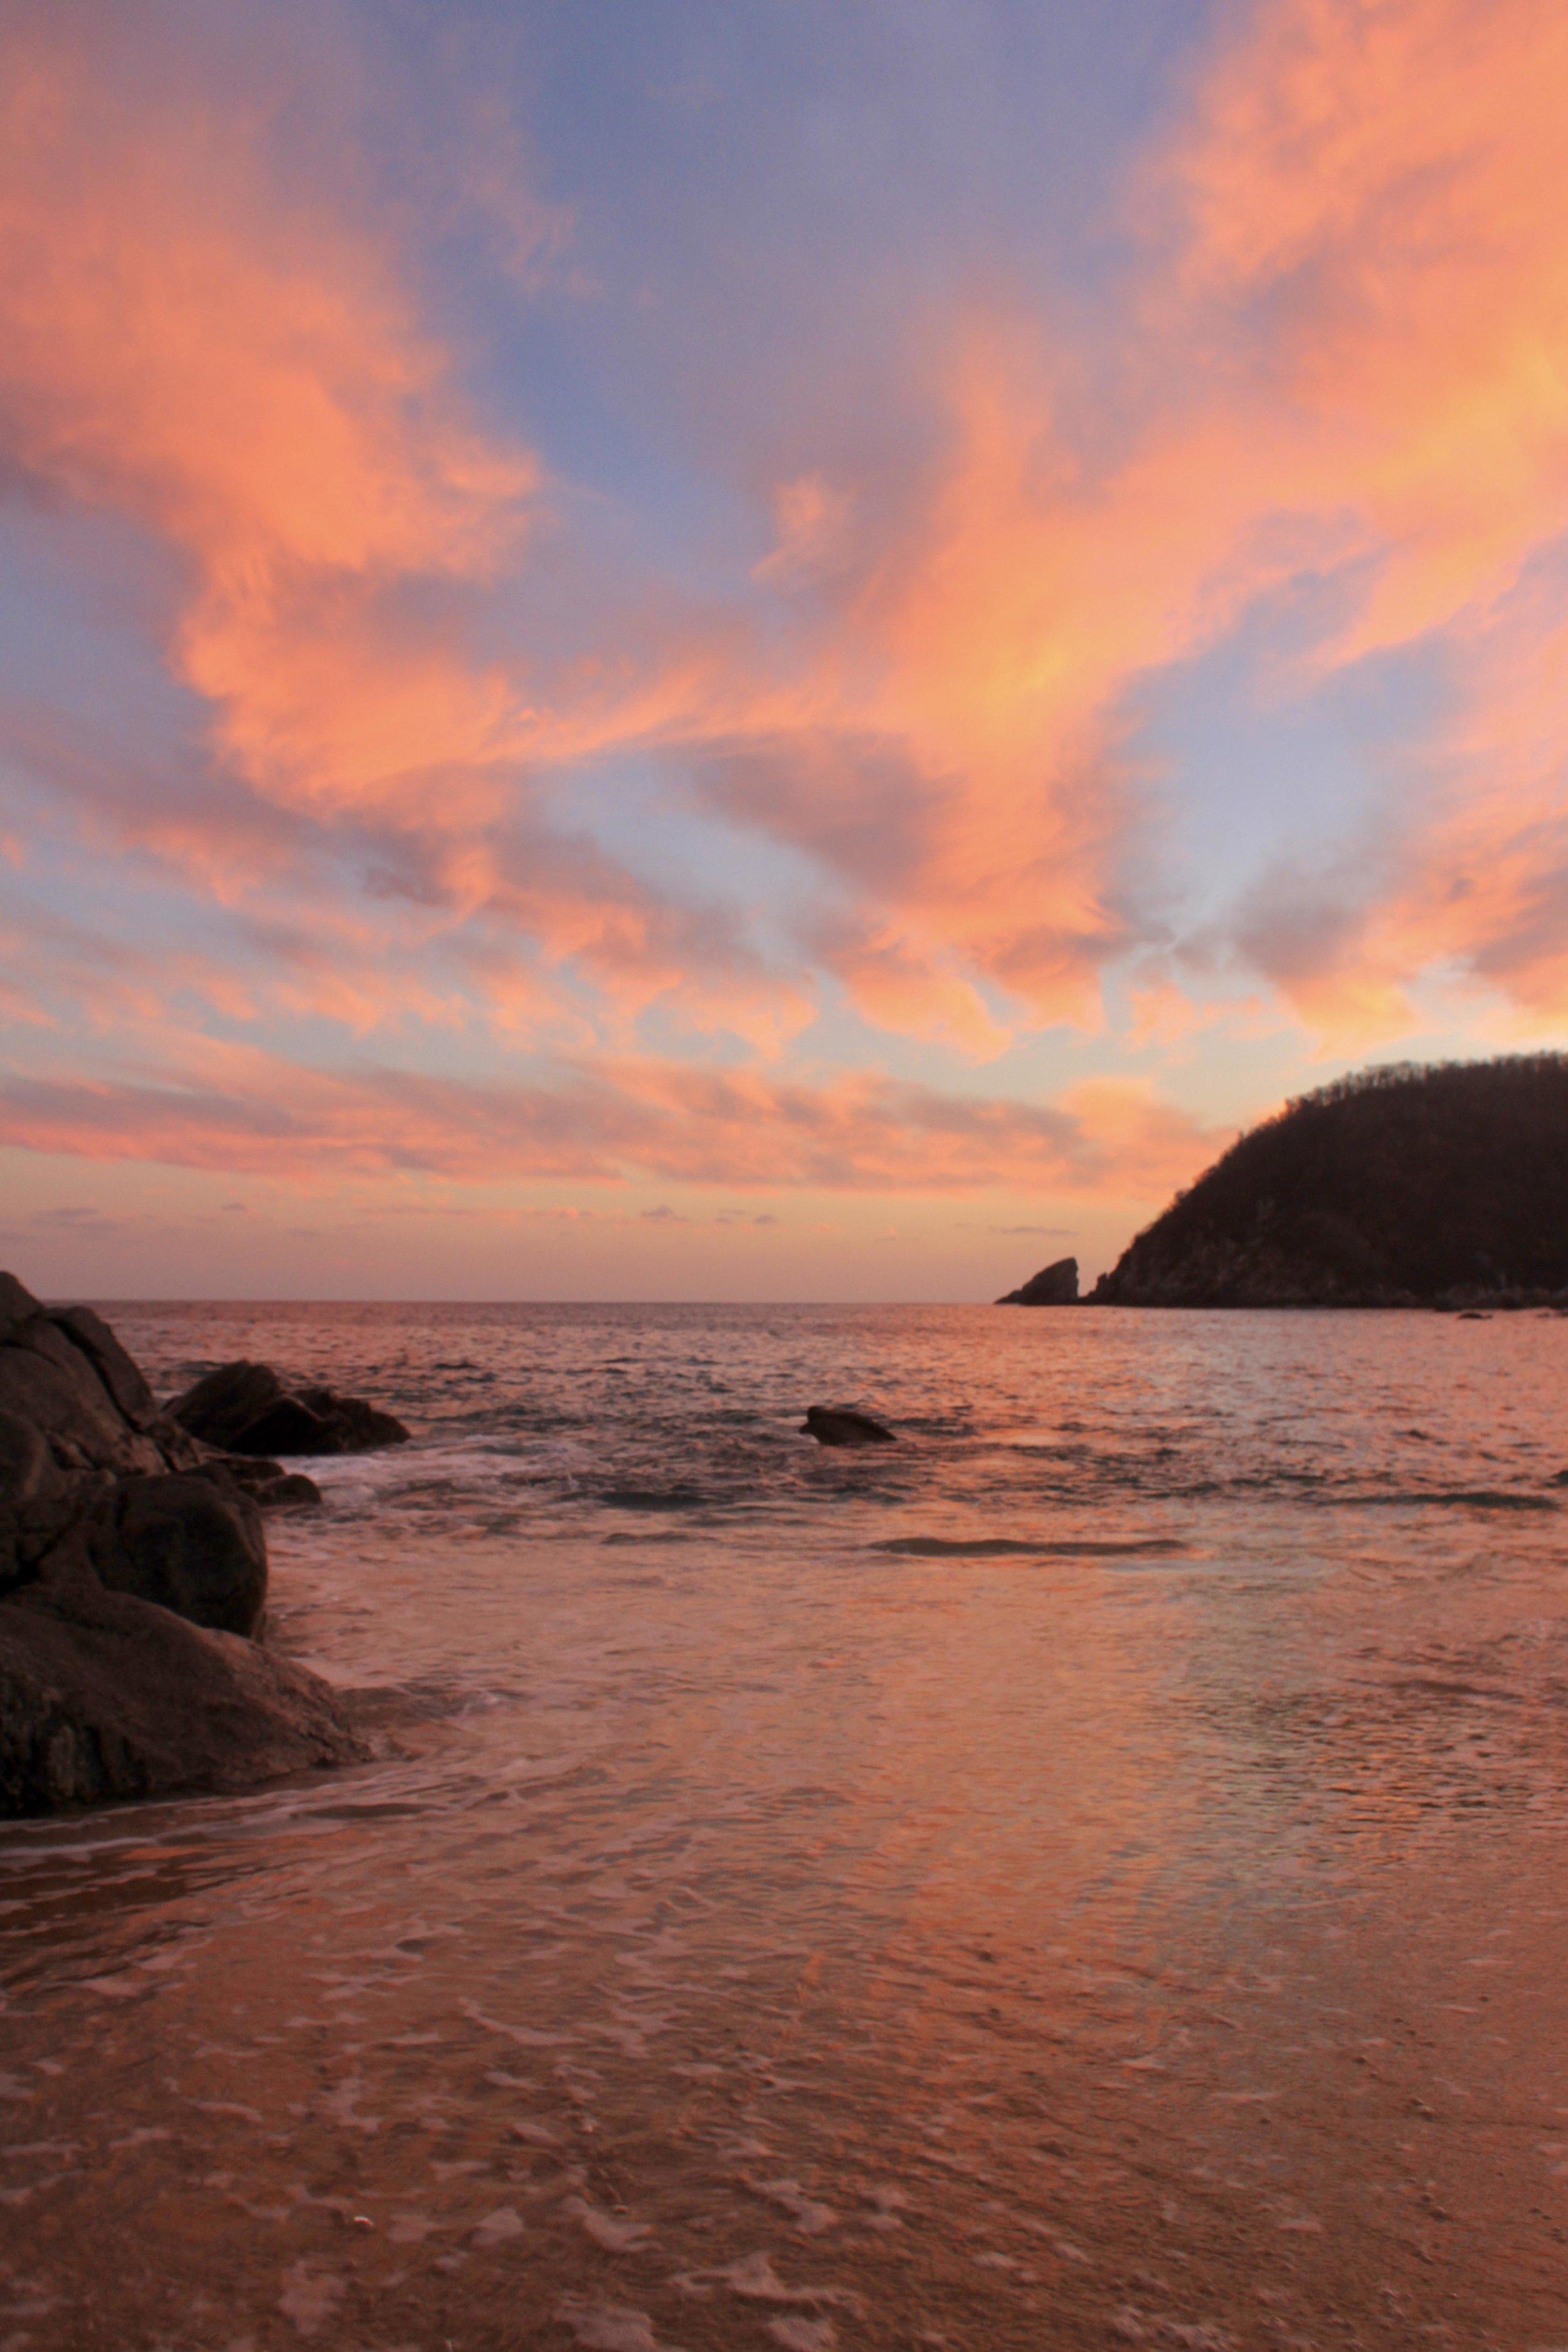 Sunset La Boquilla Hote Bahia de la Luna Oaxacan Beach